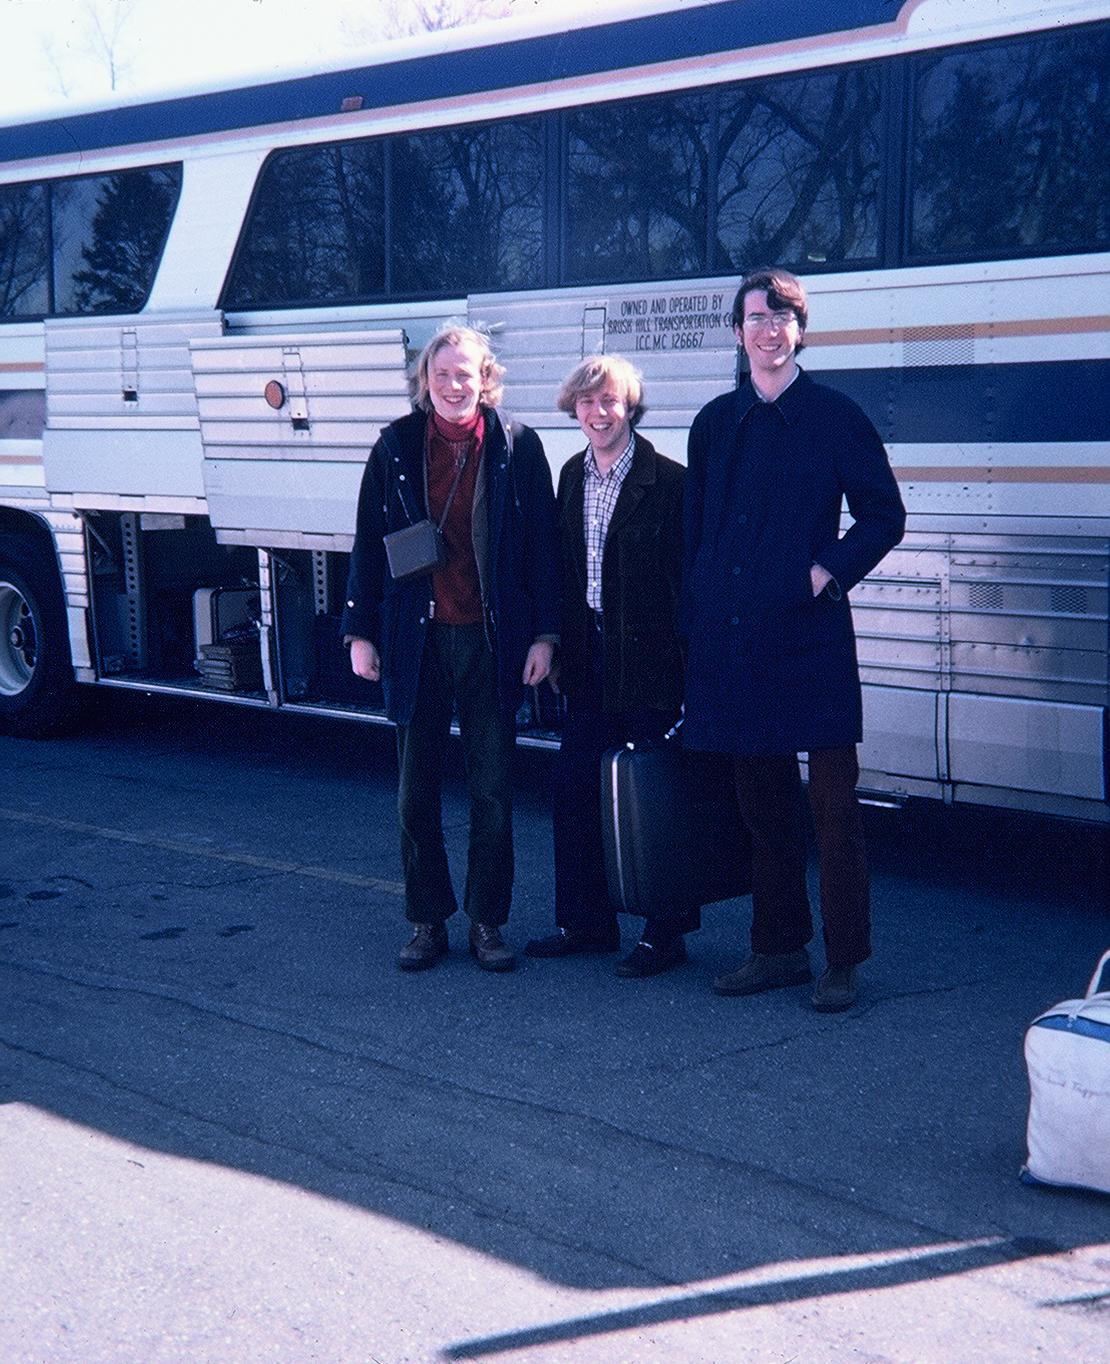 Spring_tour_1975_Birmingham_MI_staudt4-R1-E033.jpg